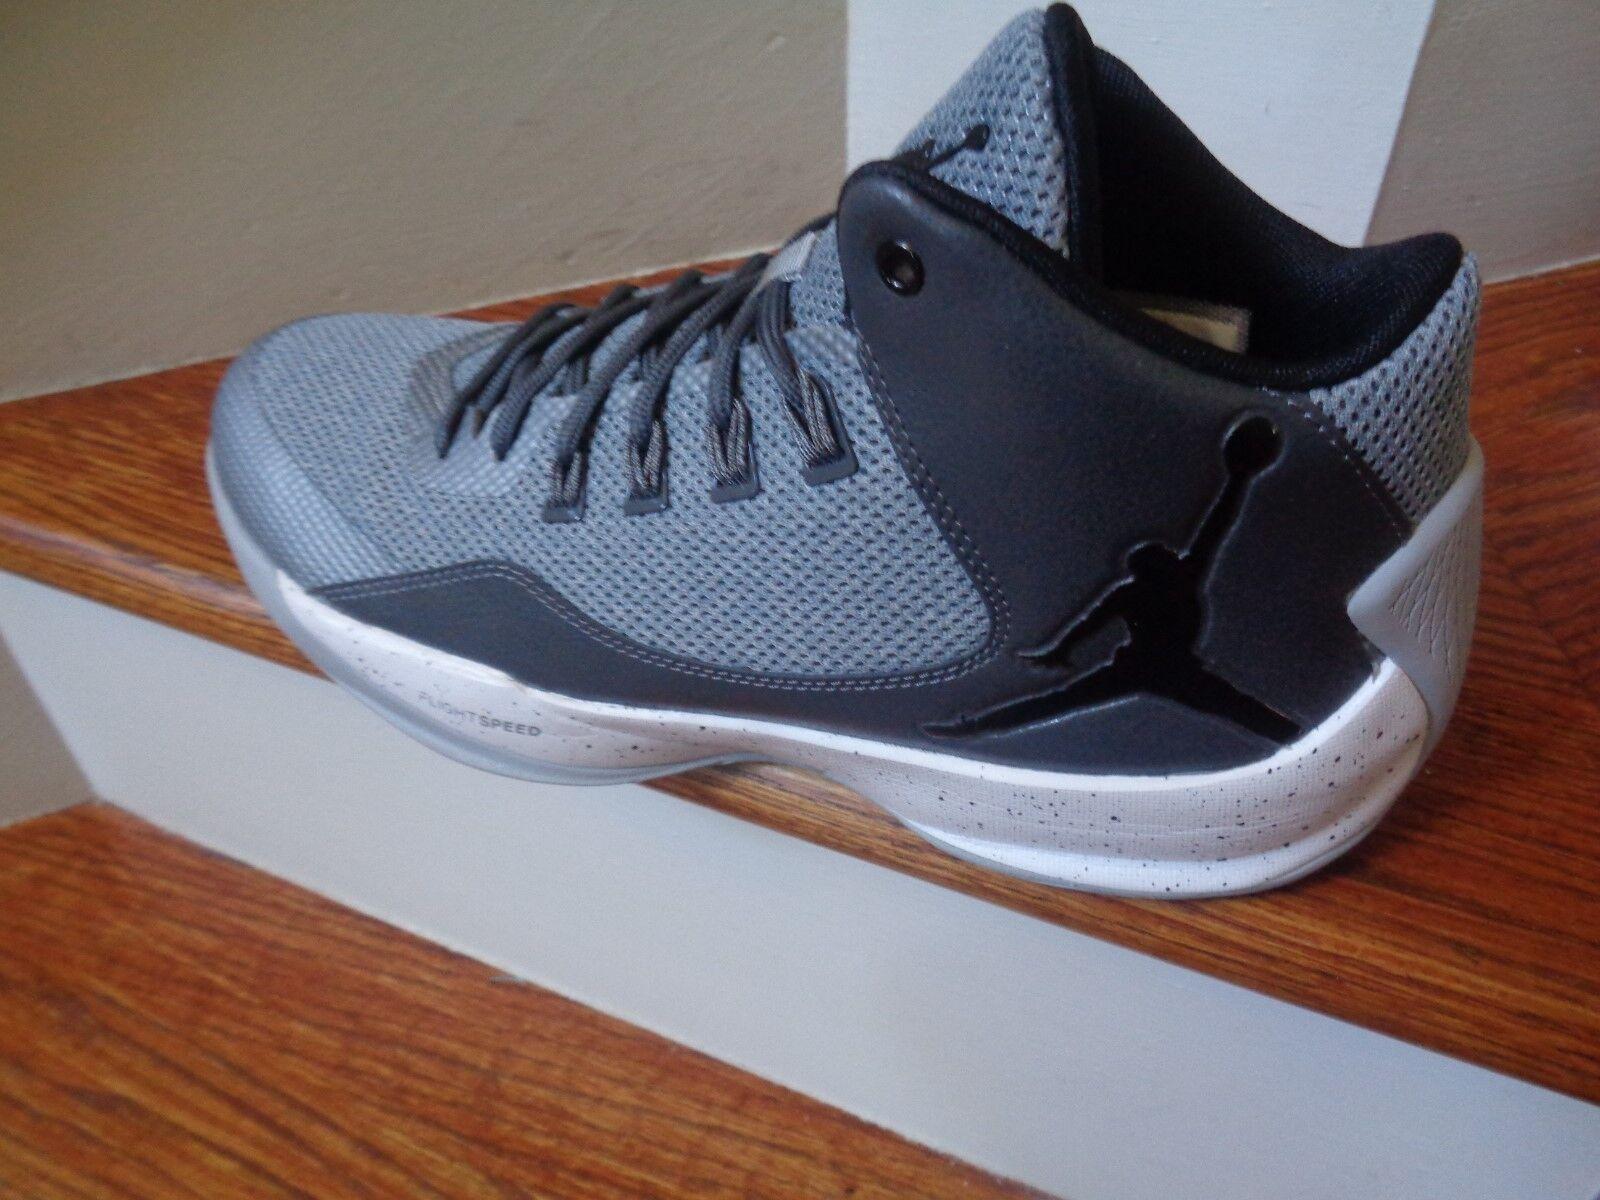 Nike Air Jordan 1 Rising High 2 Men's Basketball Shoes, 844065 007 Size 11 NEW